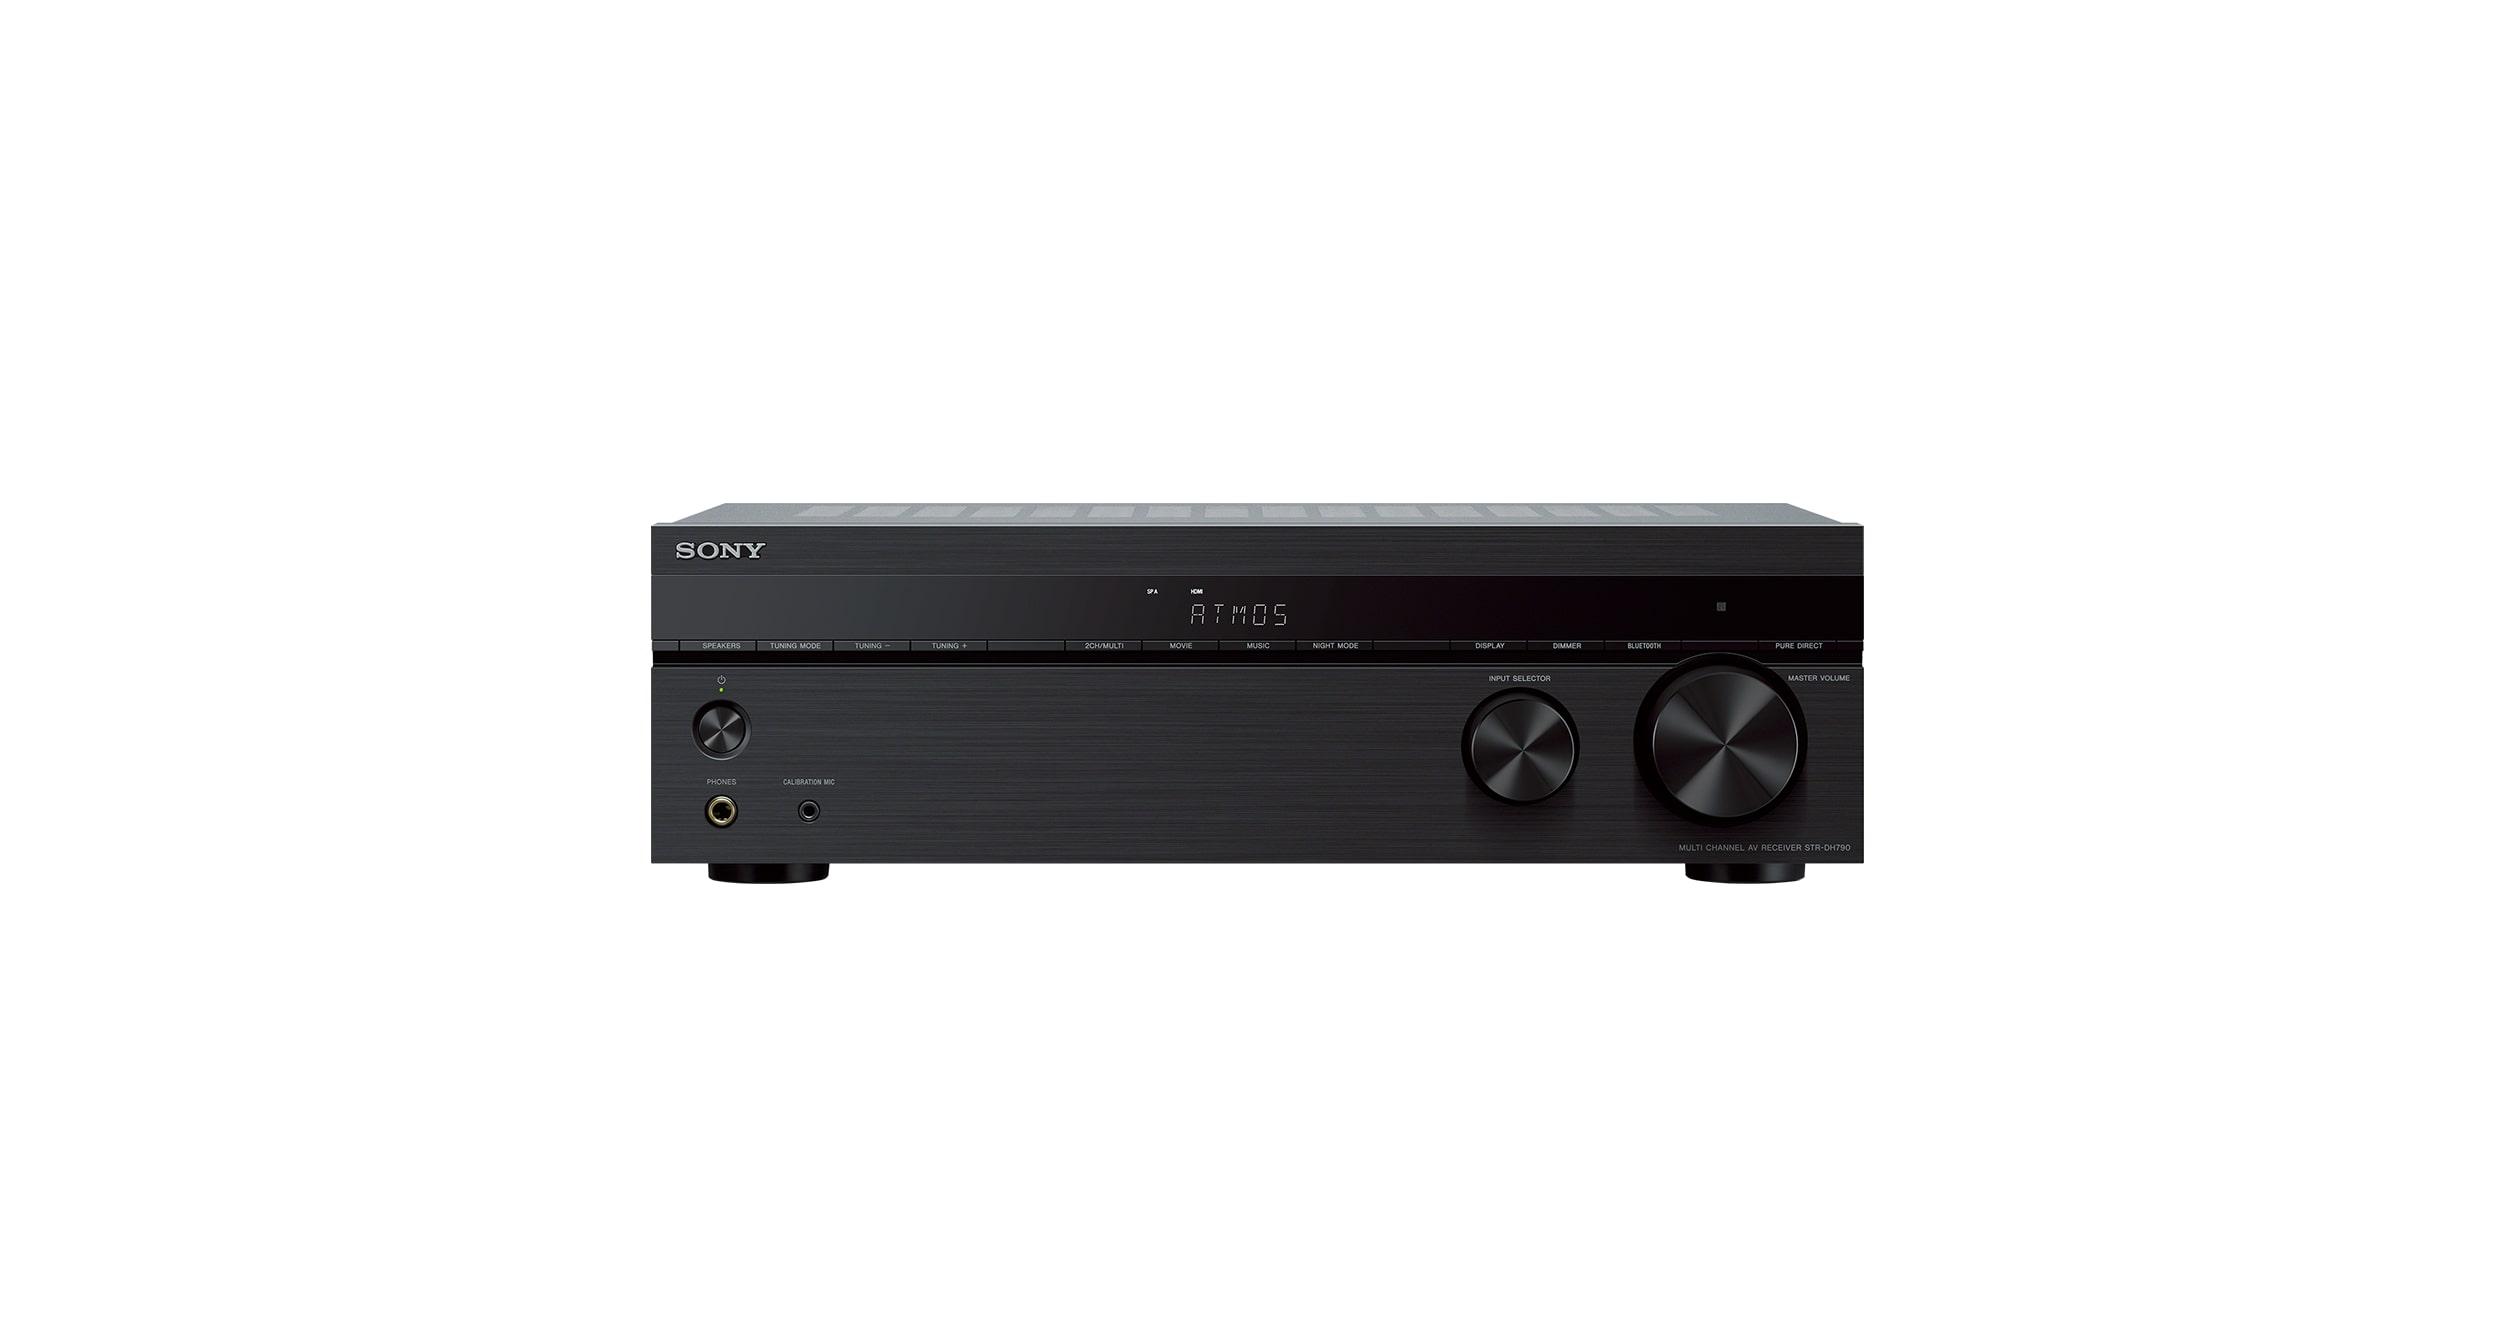 72ch Dolby Atmos Hdr 4k Av Receiver Str Dh790 Sony Asia Pacific Drive 5 Car Stereo Manual